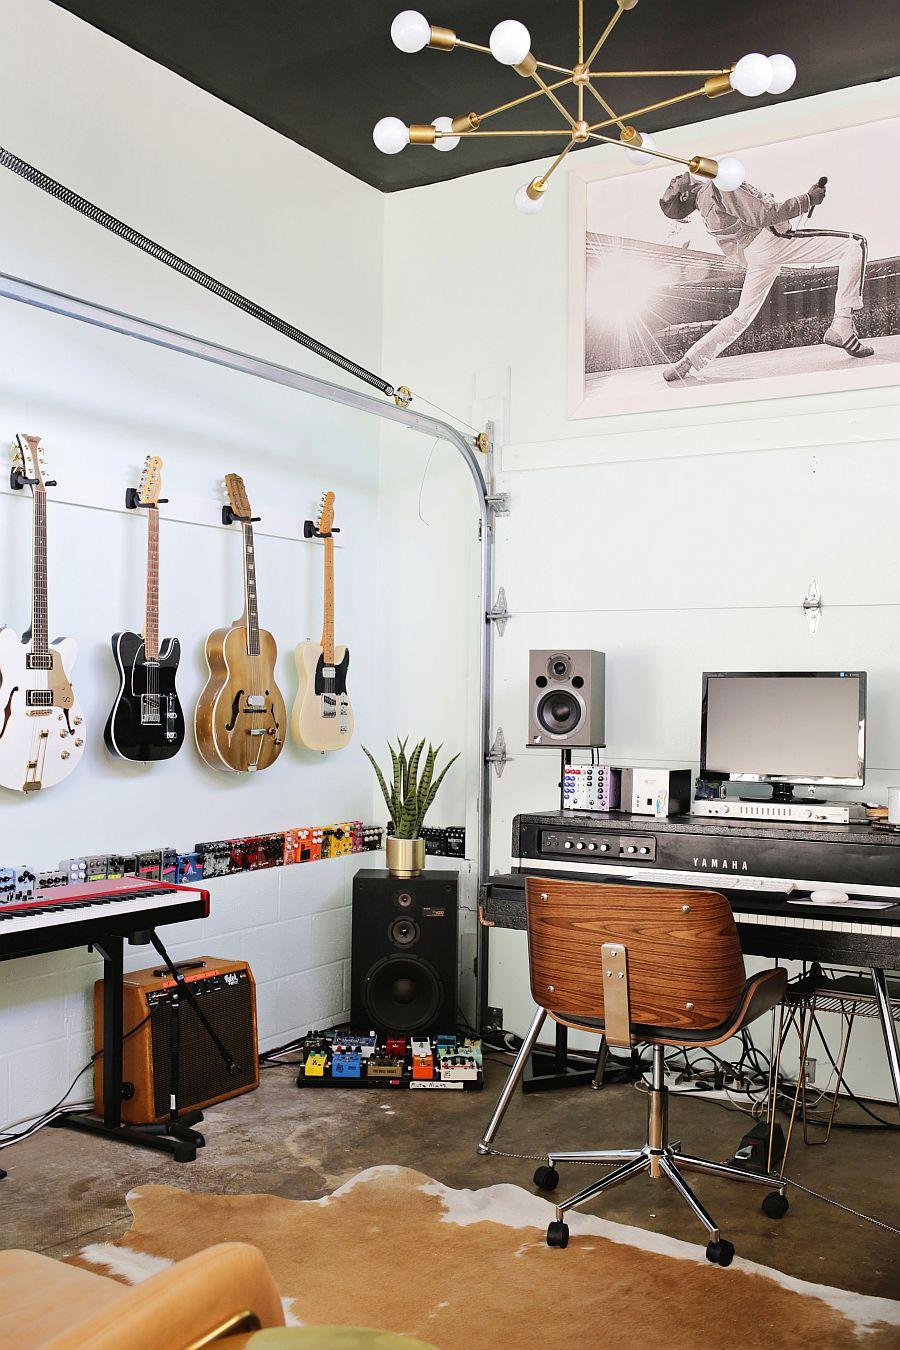 25 Garage Organization Tips and DIY Projects on Organized Garage  id=76890